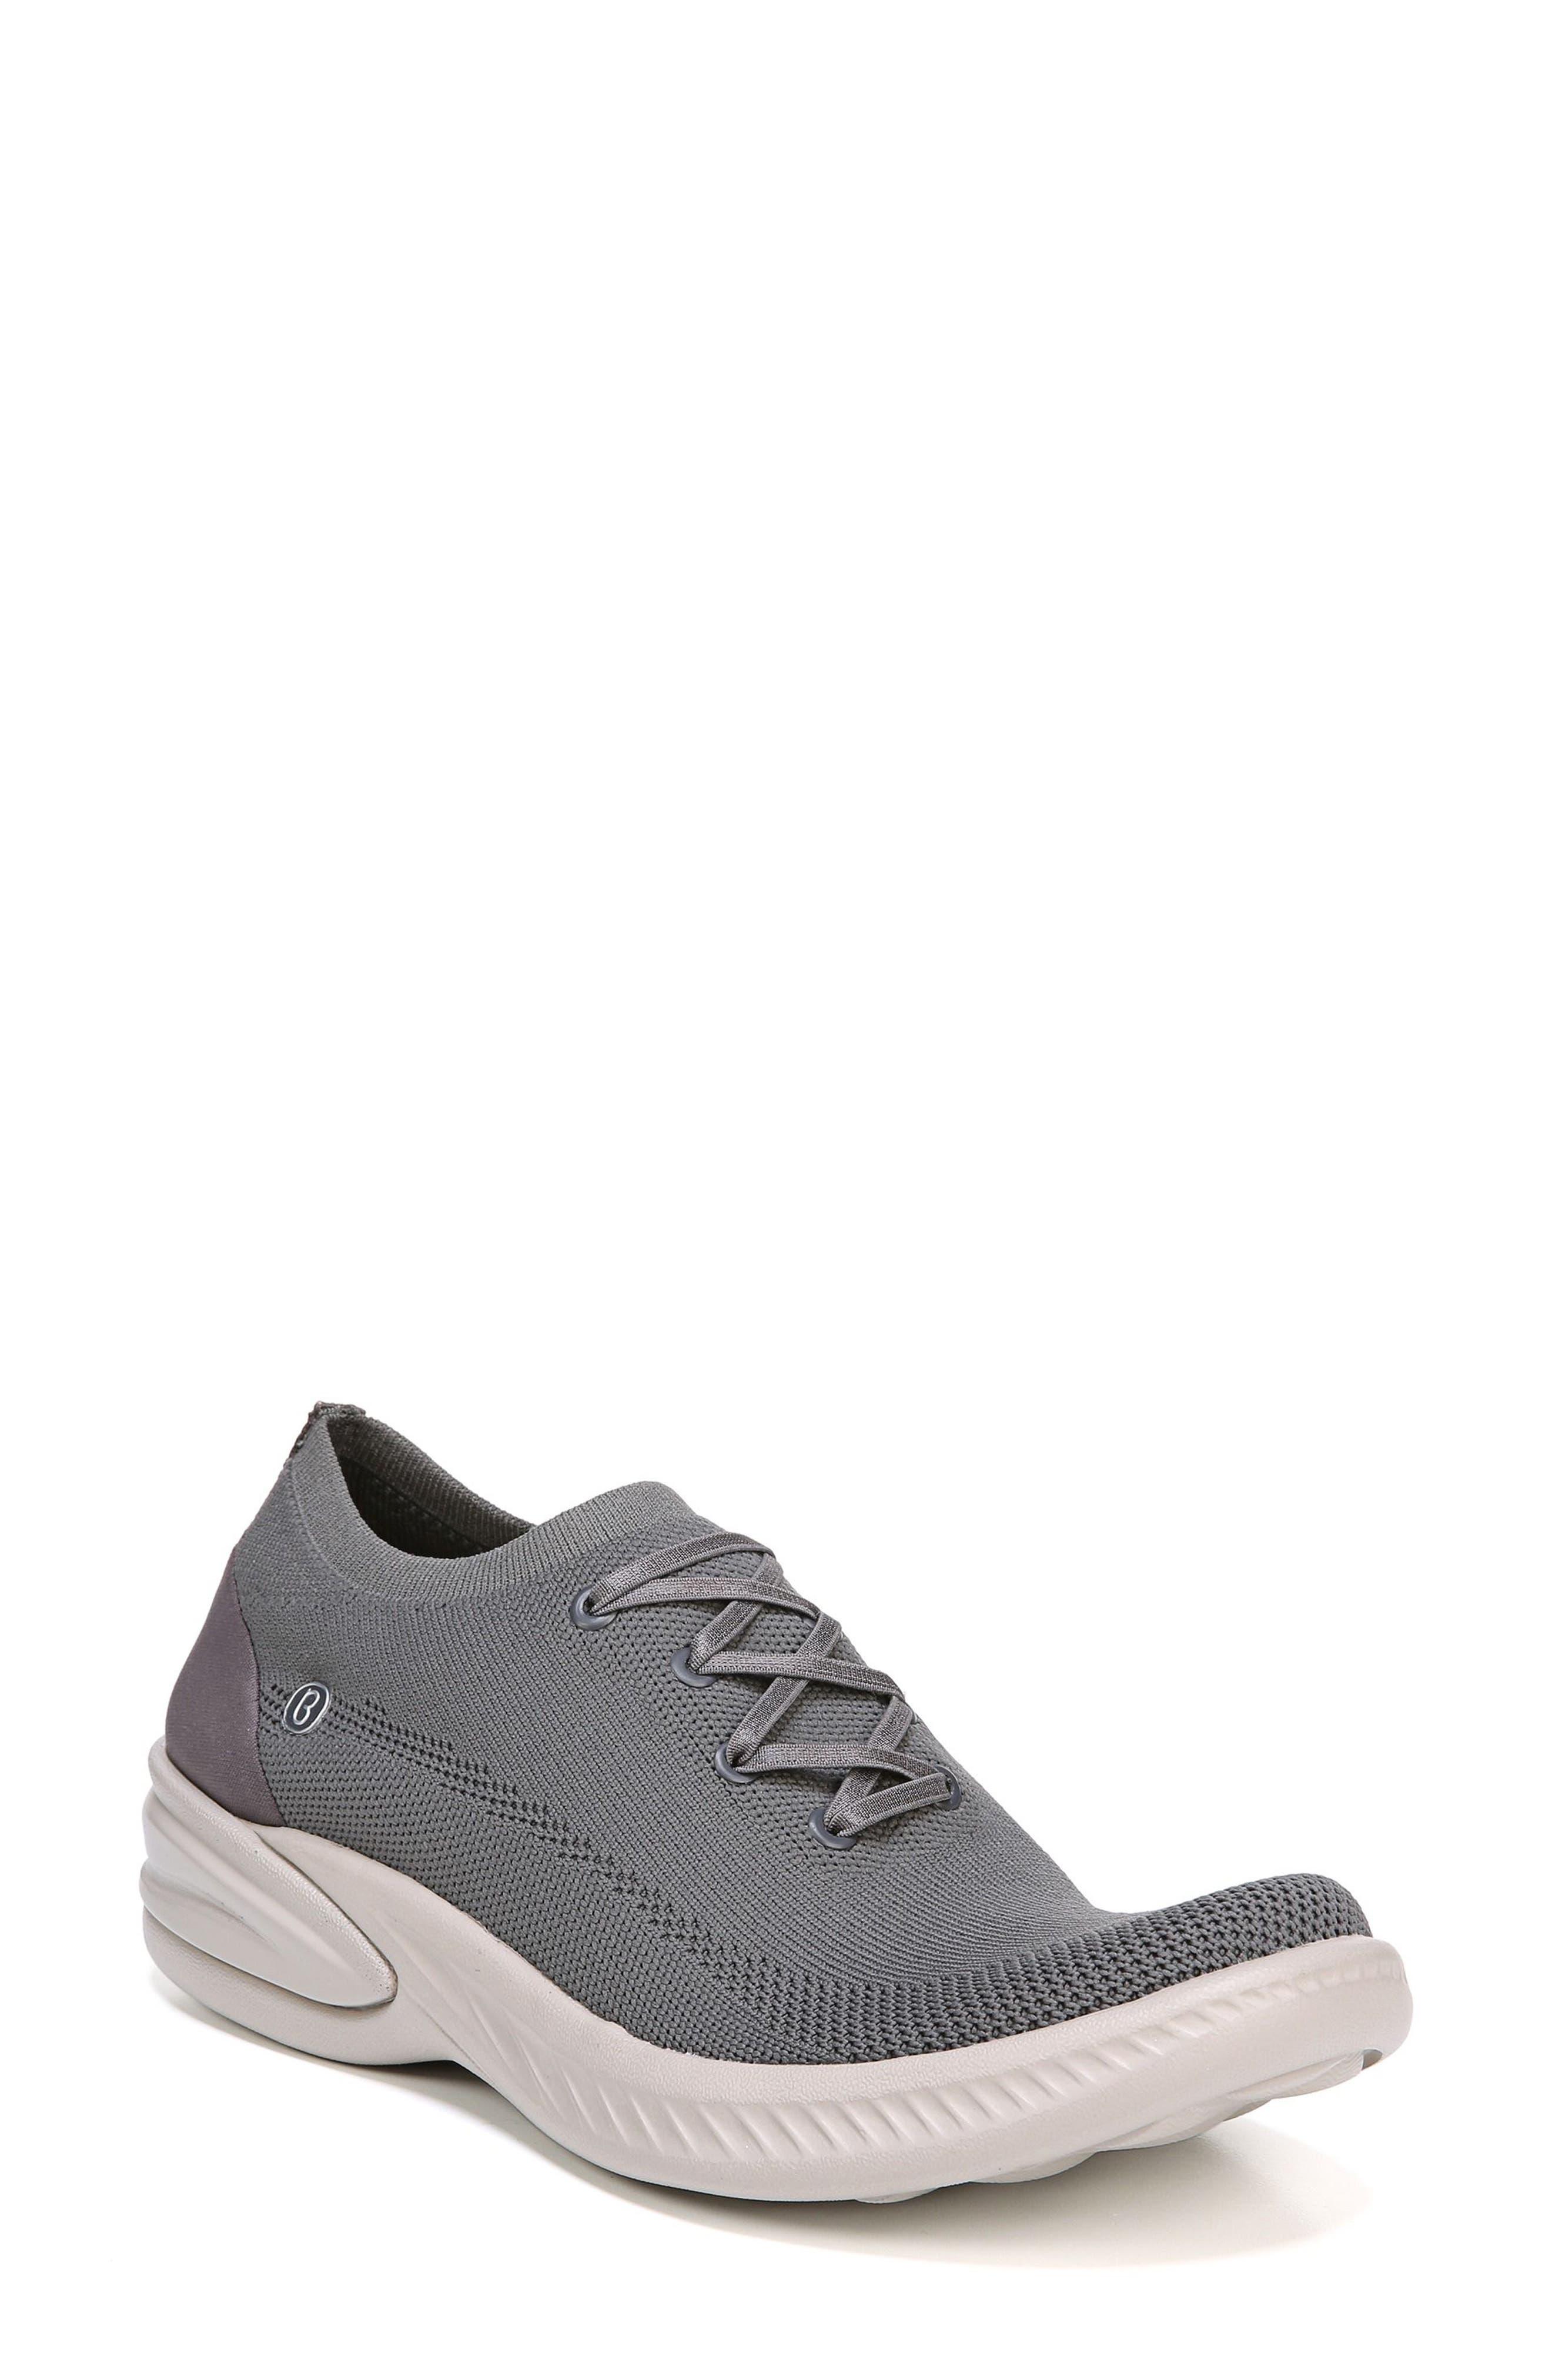 Nuance Slip-On Sneaker 9Women), Main, color, GREY FABRIC